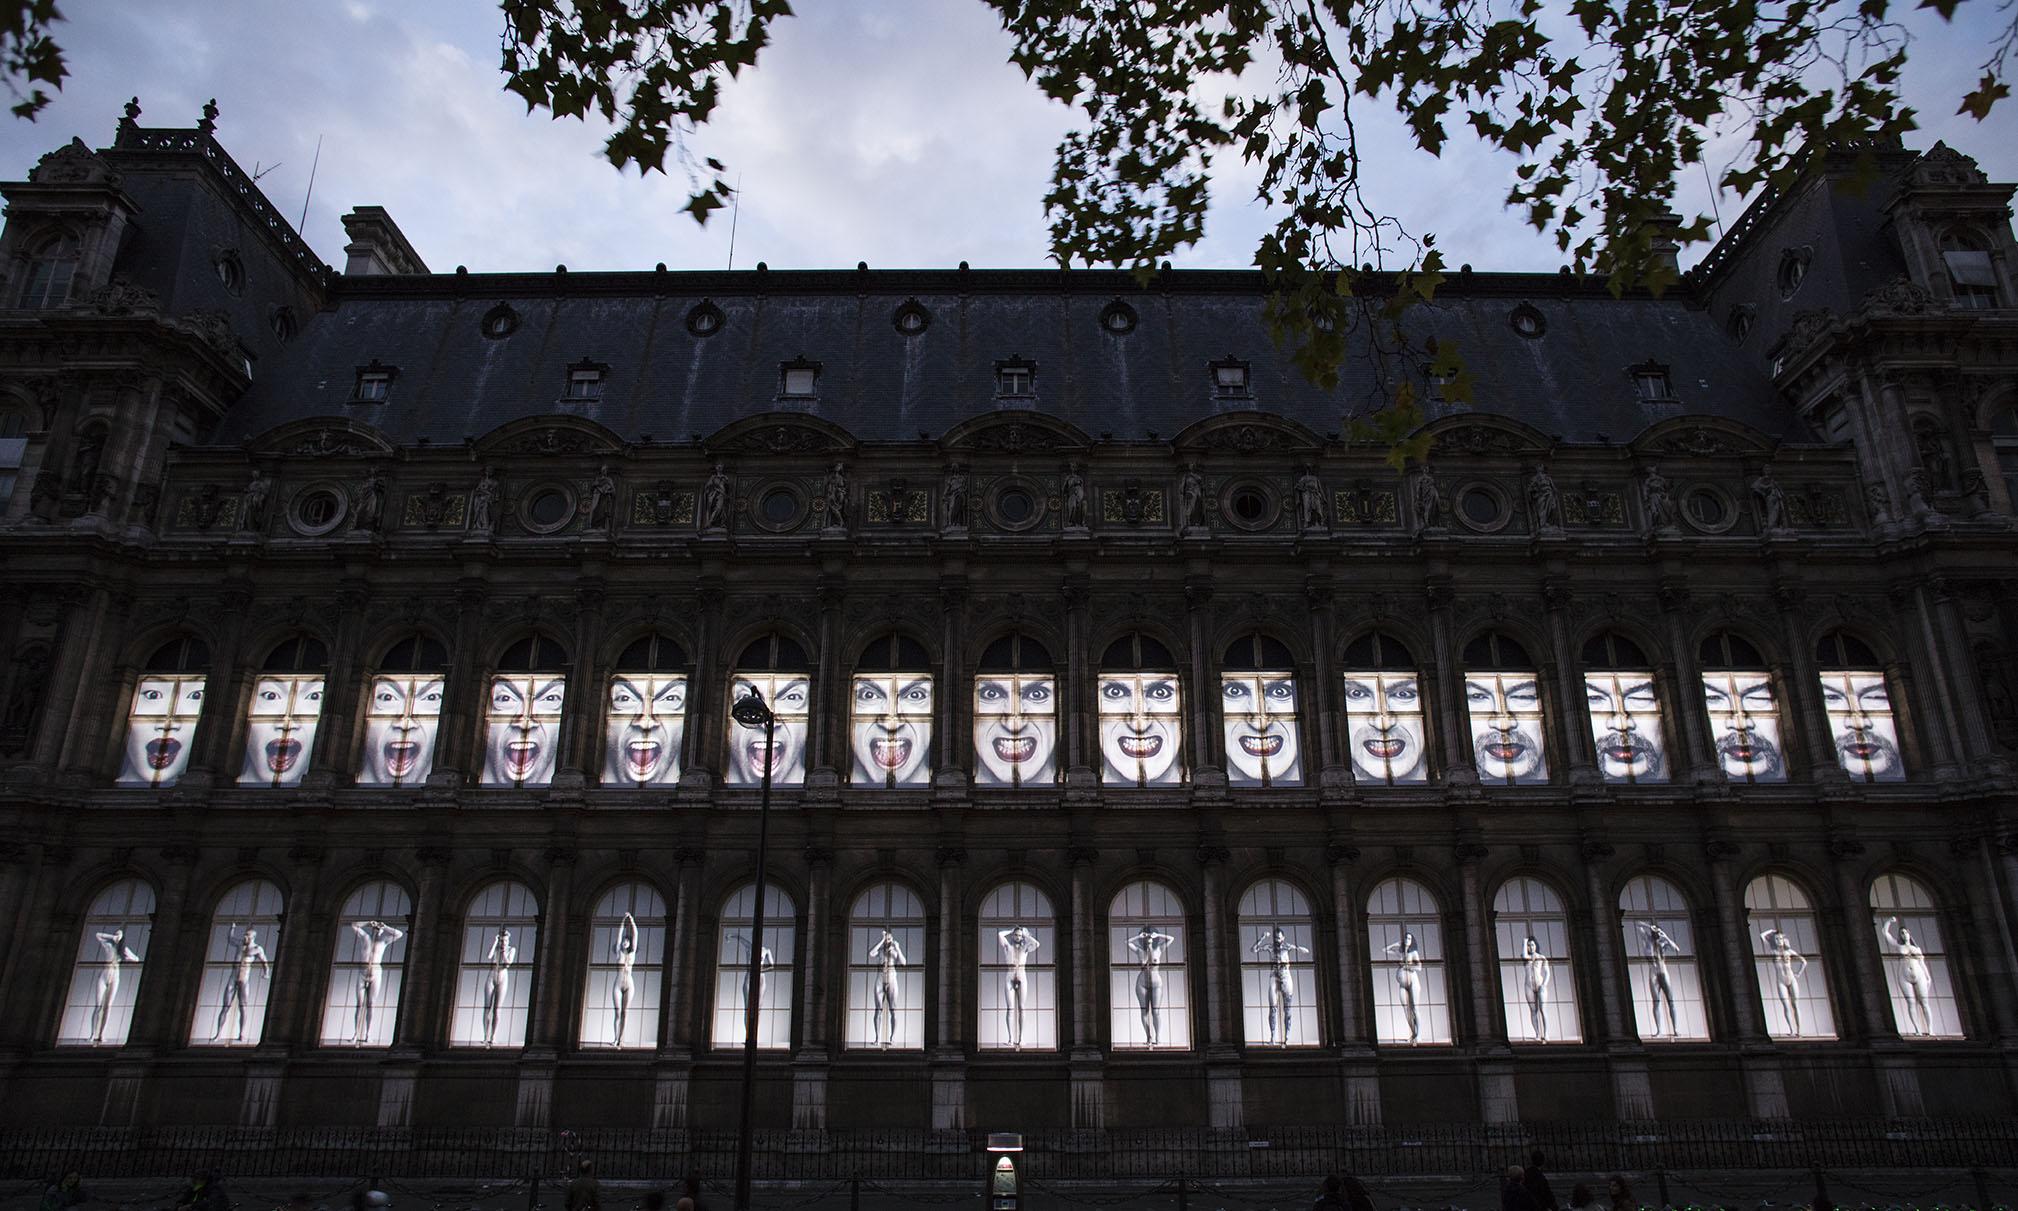 Erwin Olaf, La nuit Blanche 2016,Paris - Courtesy the artist and Rabouan Moussion Gallery Paris